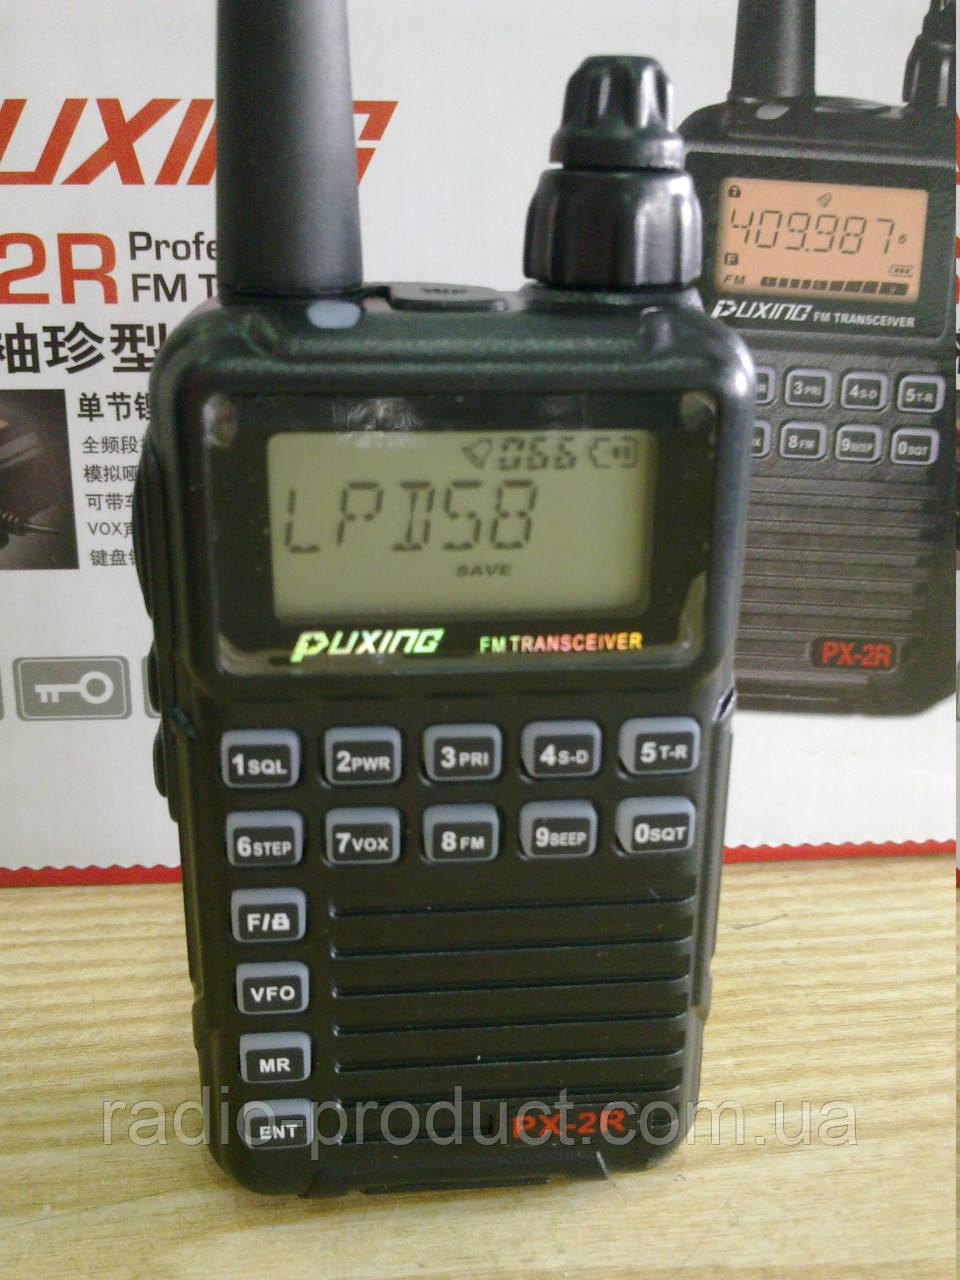 Рация, радиостанция Puxing PX-2R Plus UHF